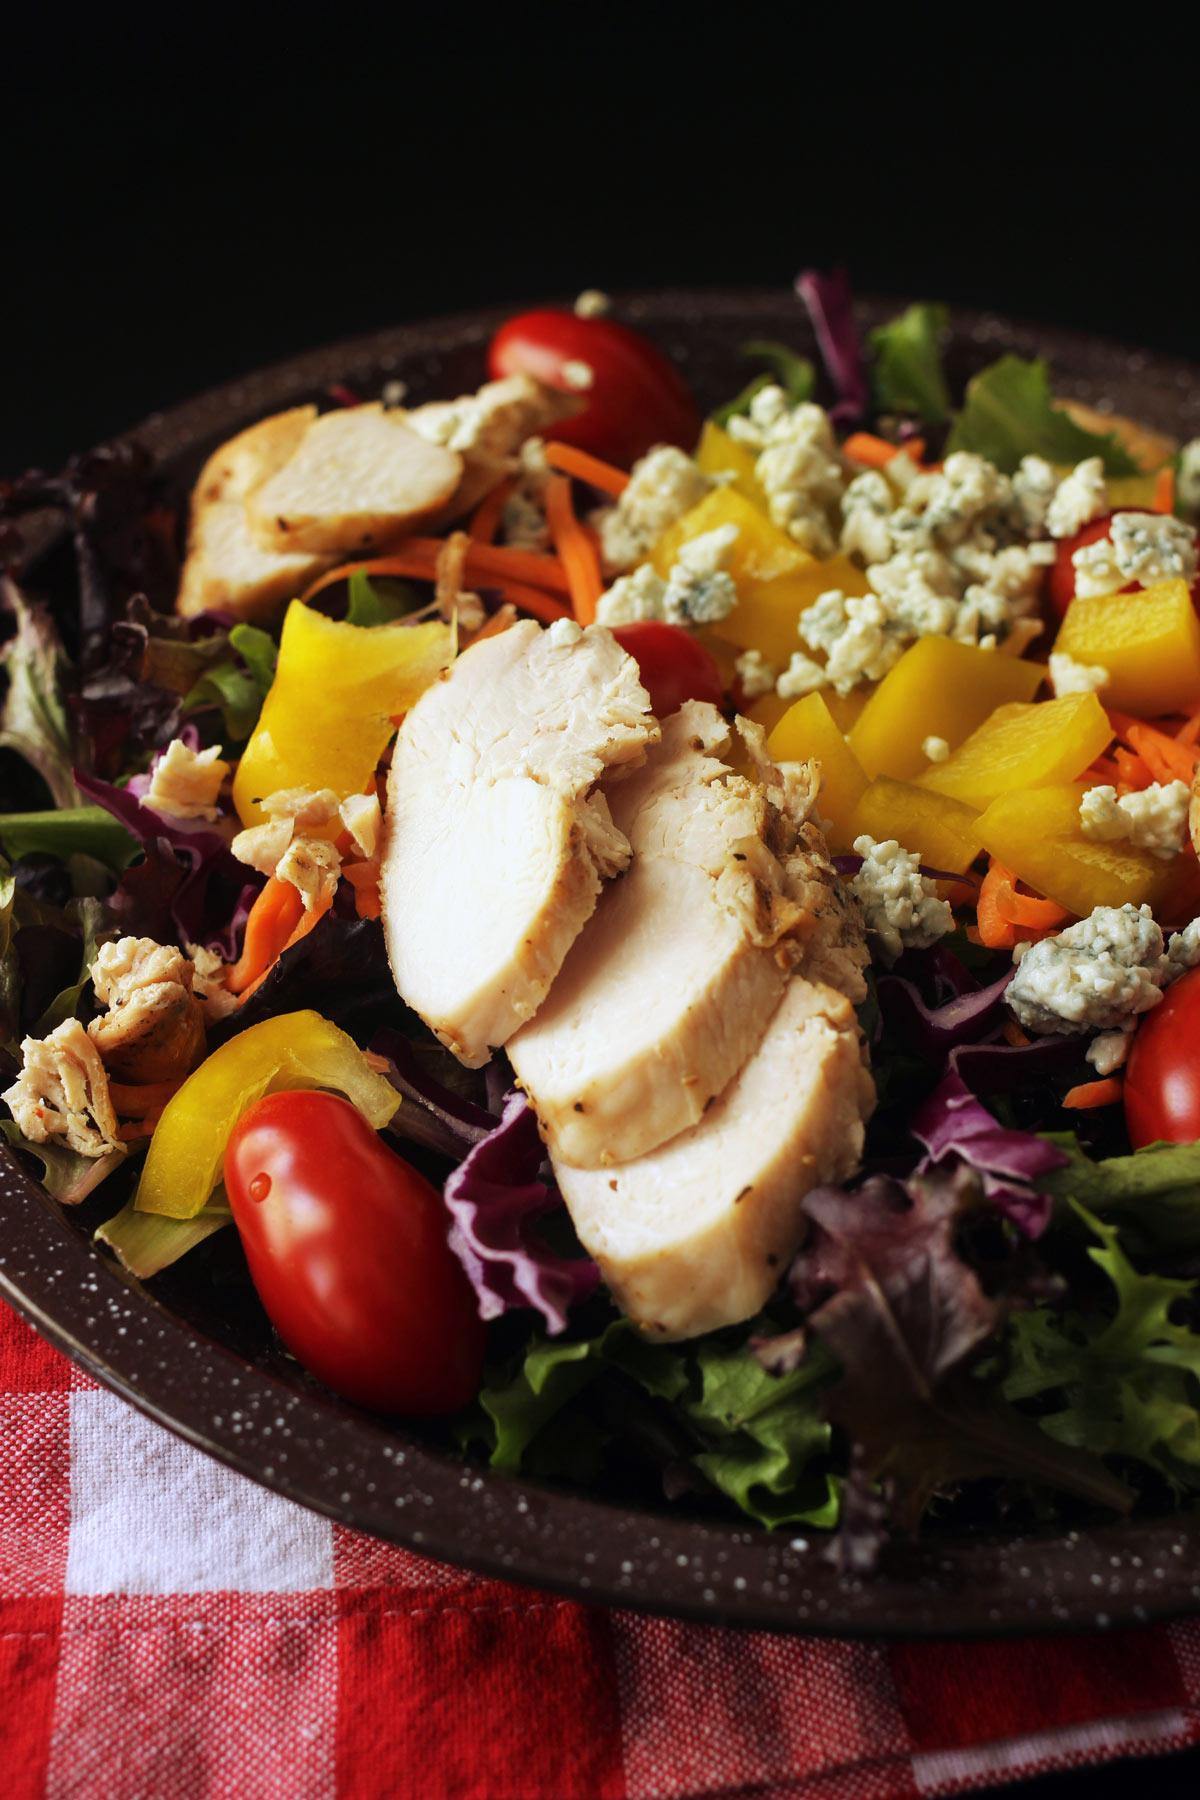 grilled chicken strips atop salad